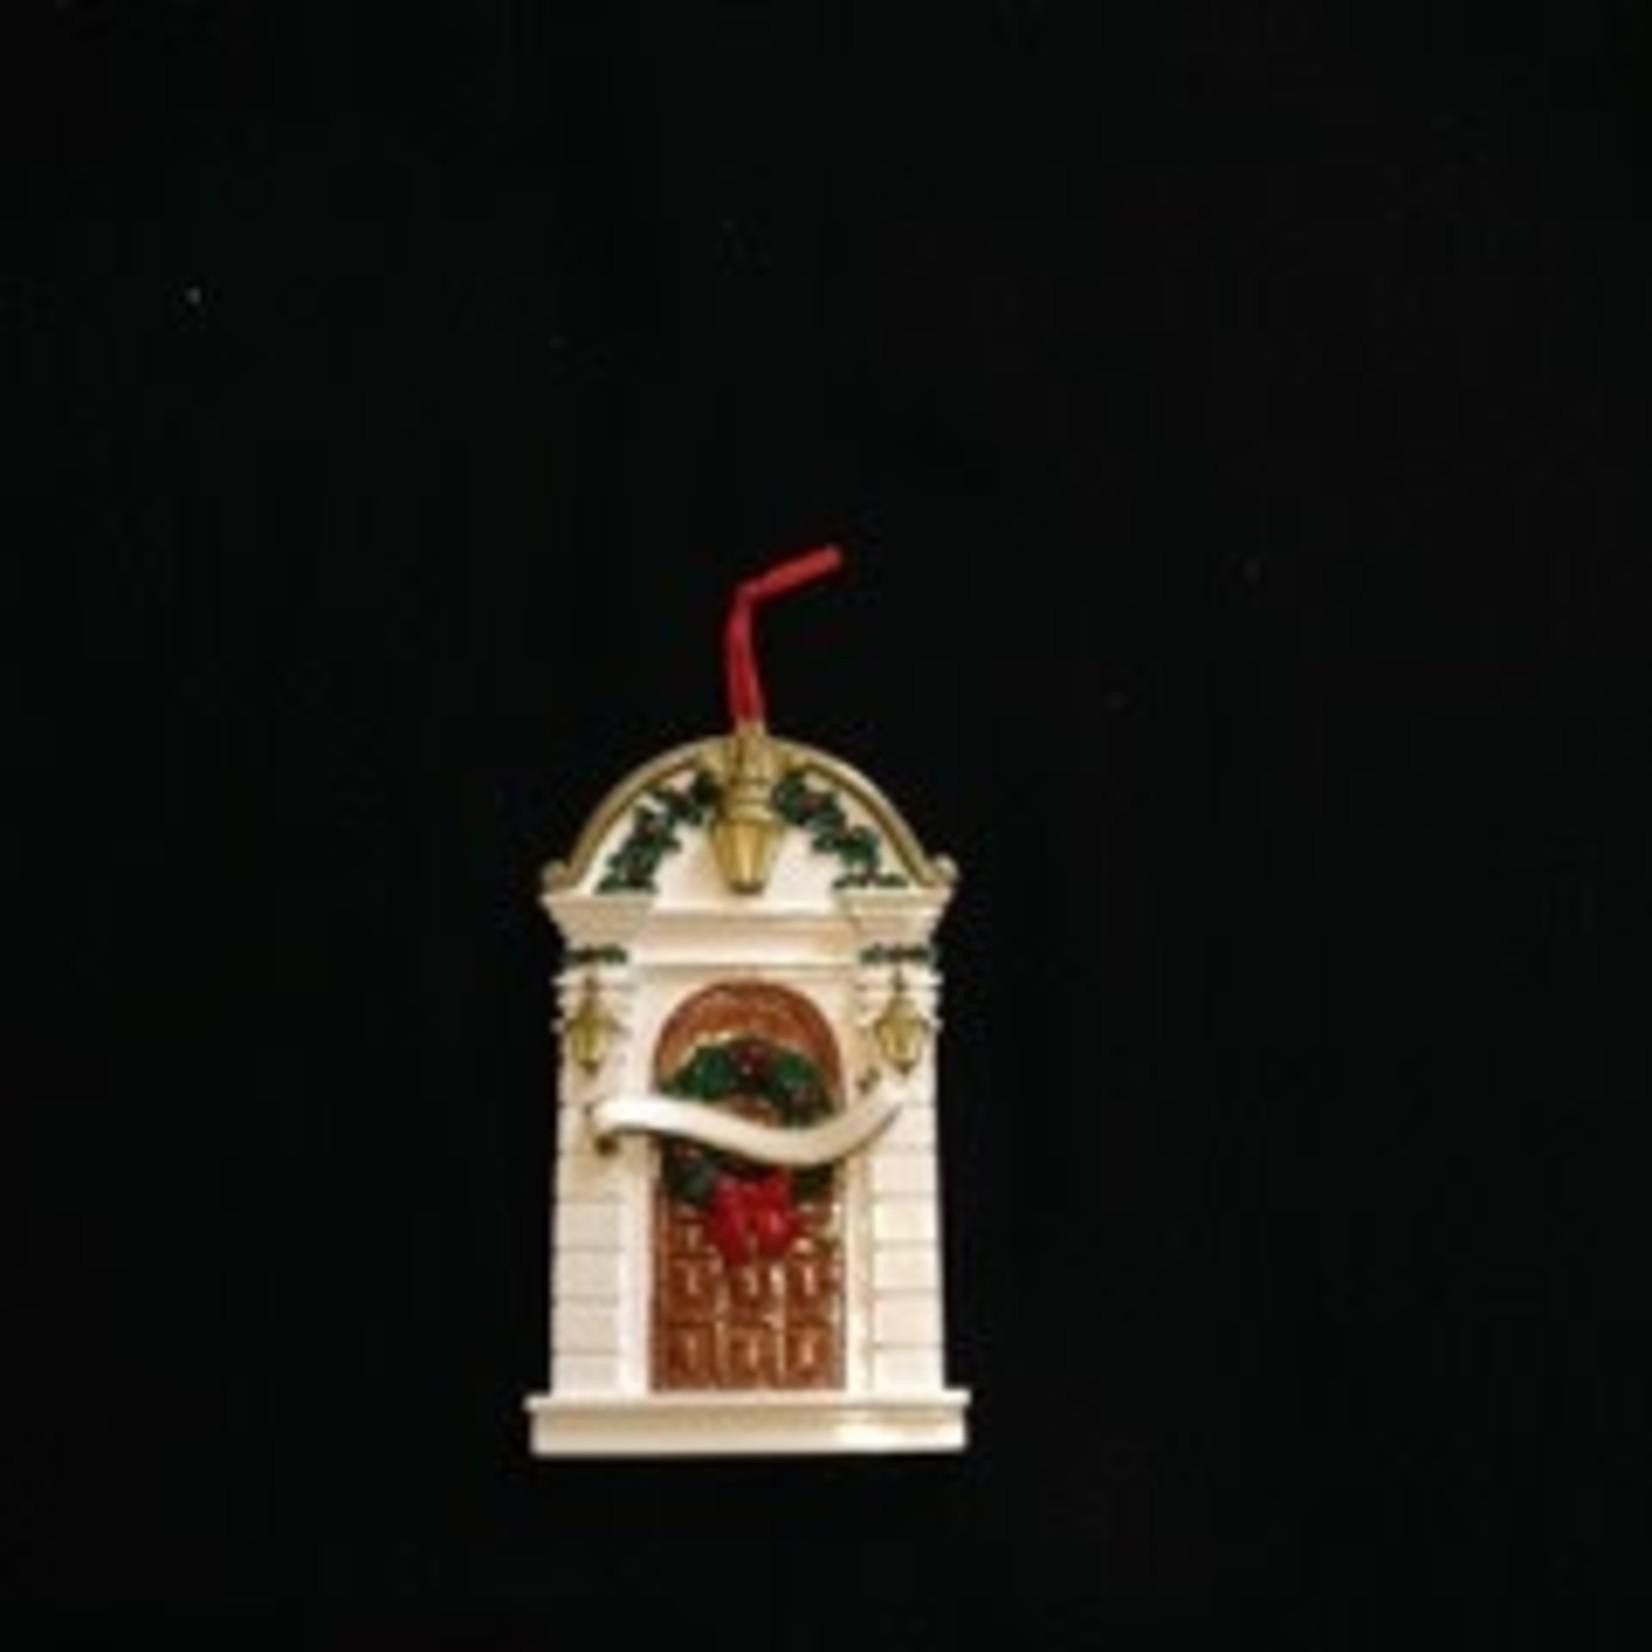 Holly Door Ornament